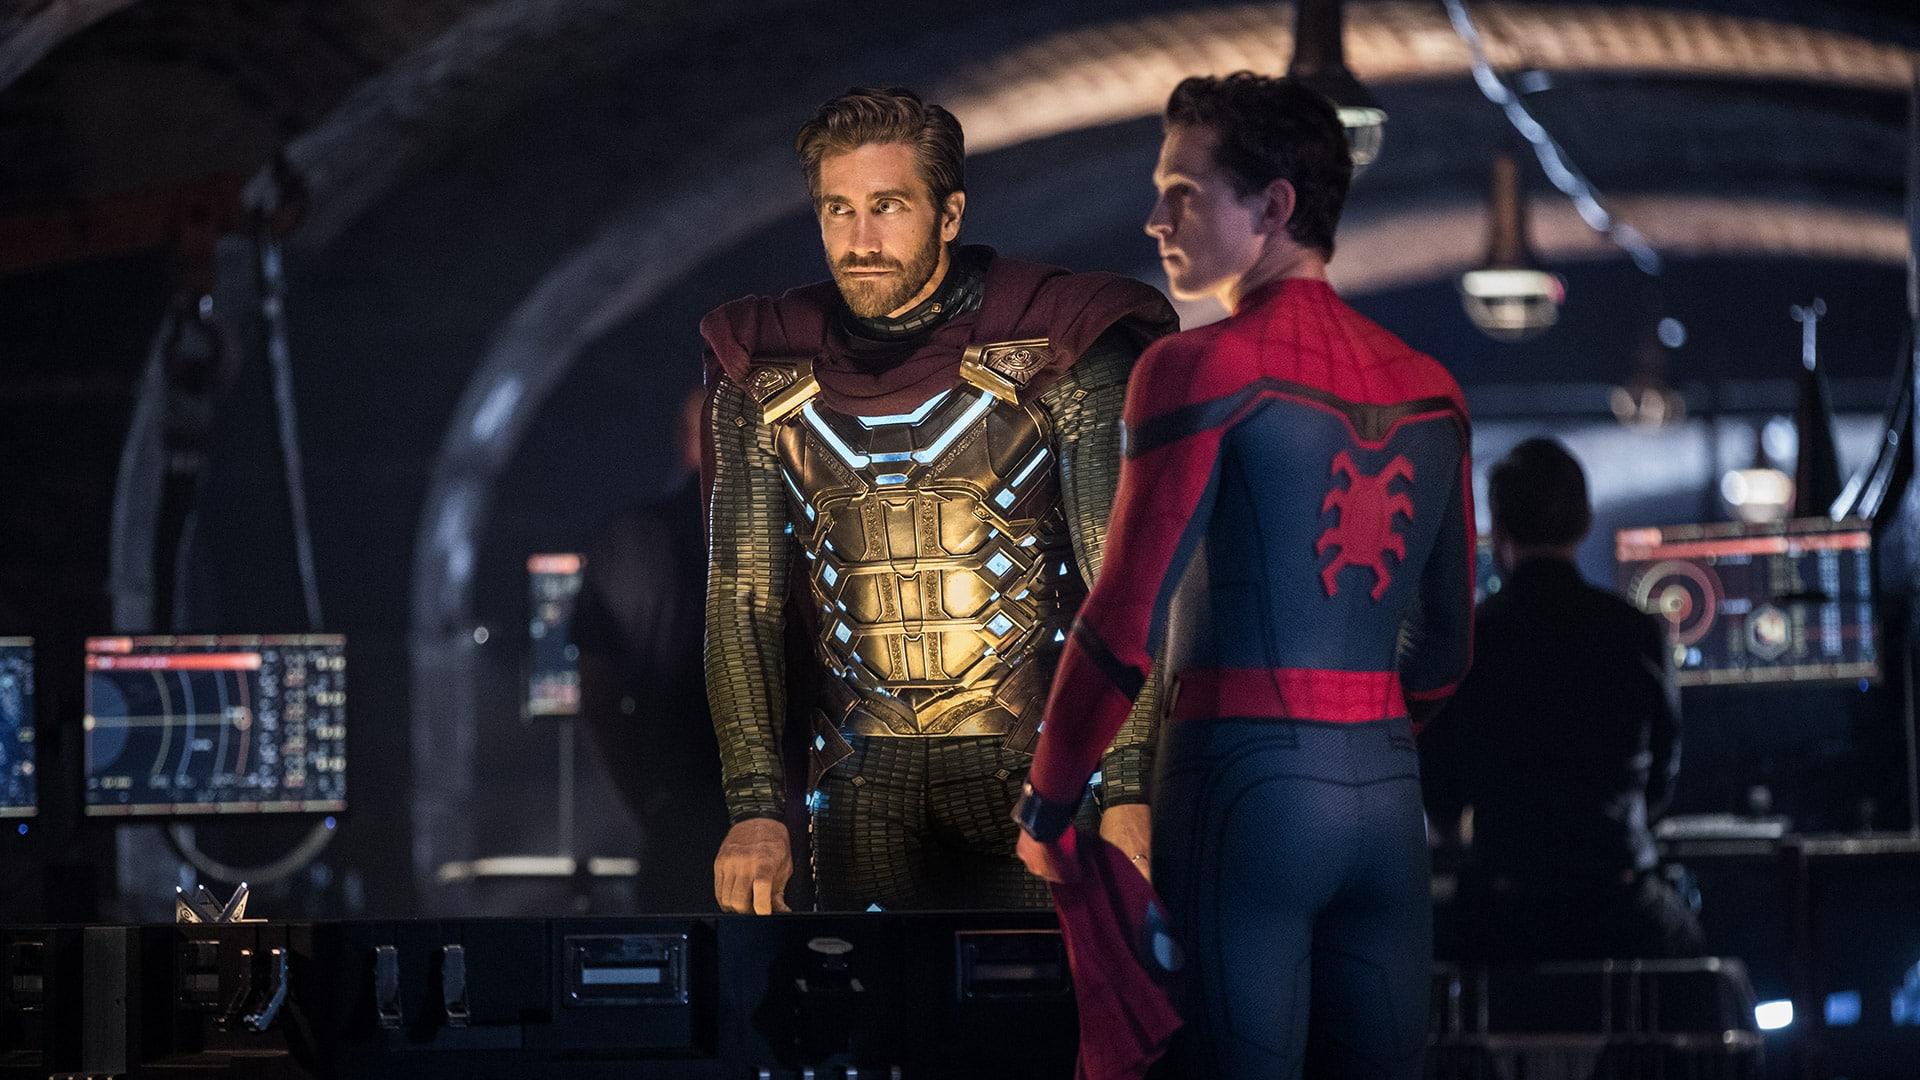 Spider Man skuespillere dating hvordan du får en fyr online dating